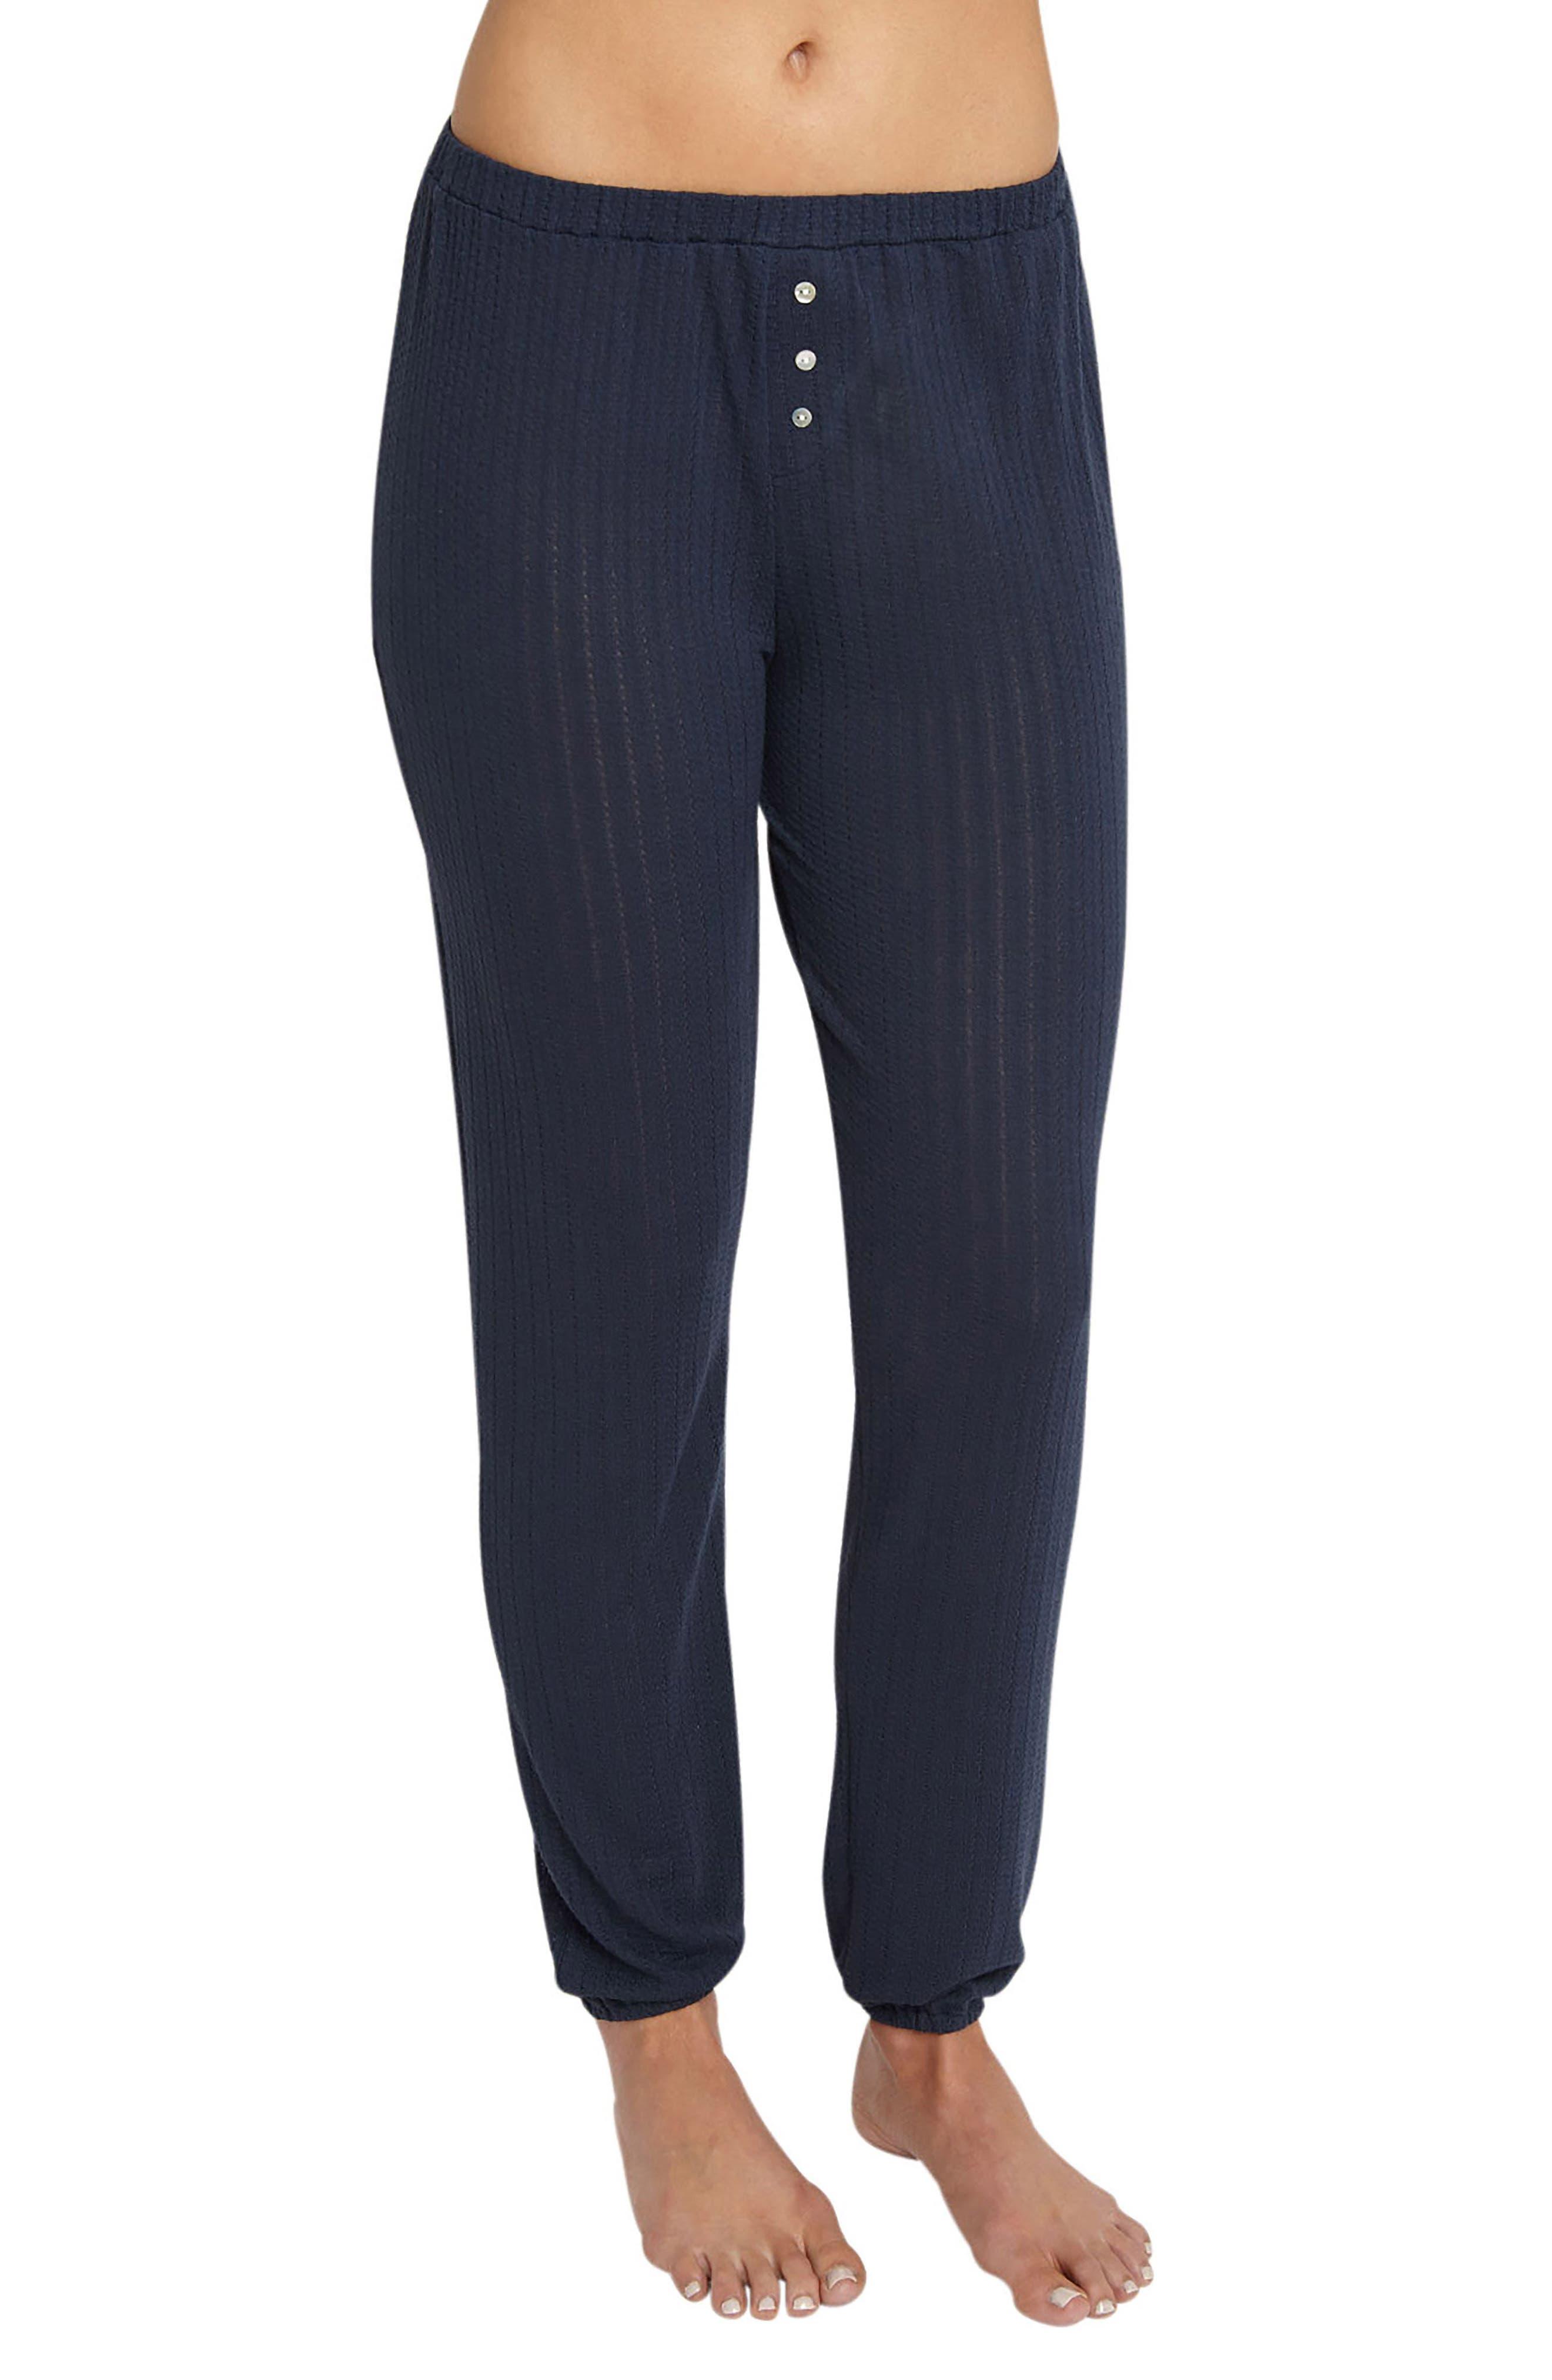 Alternate Image 1 Selected - Eberjey Blue Nights Baxter Pants